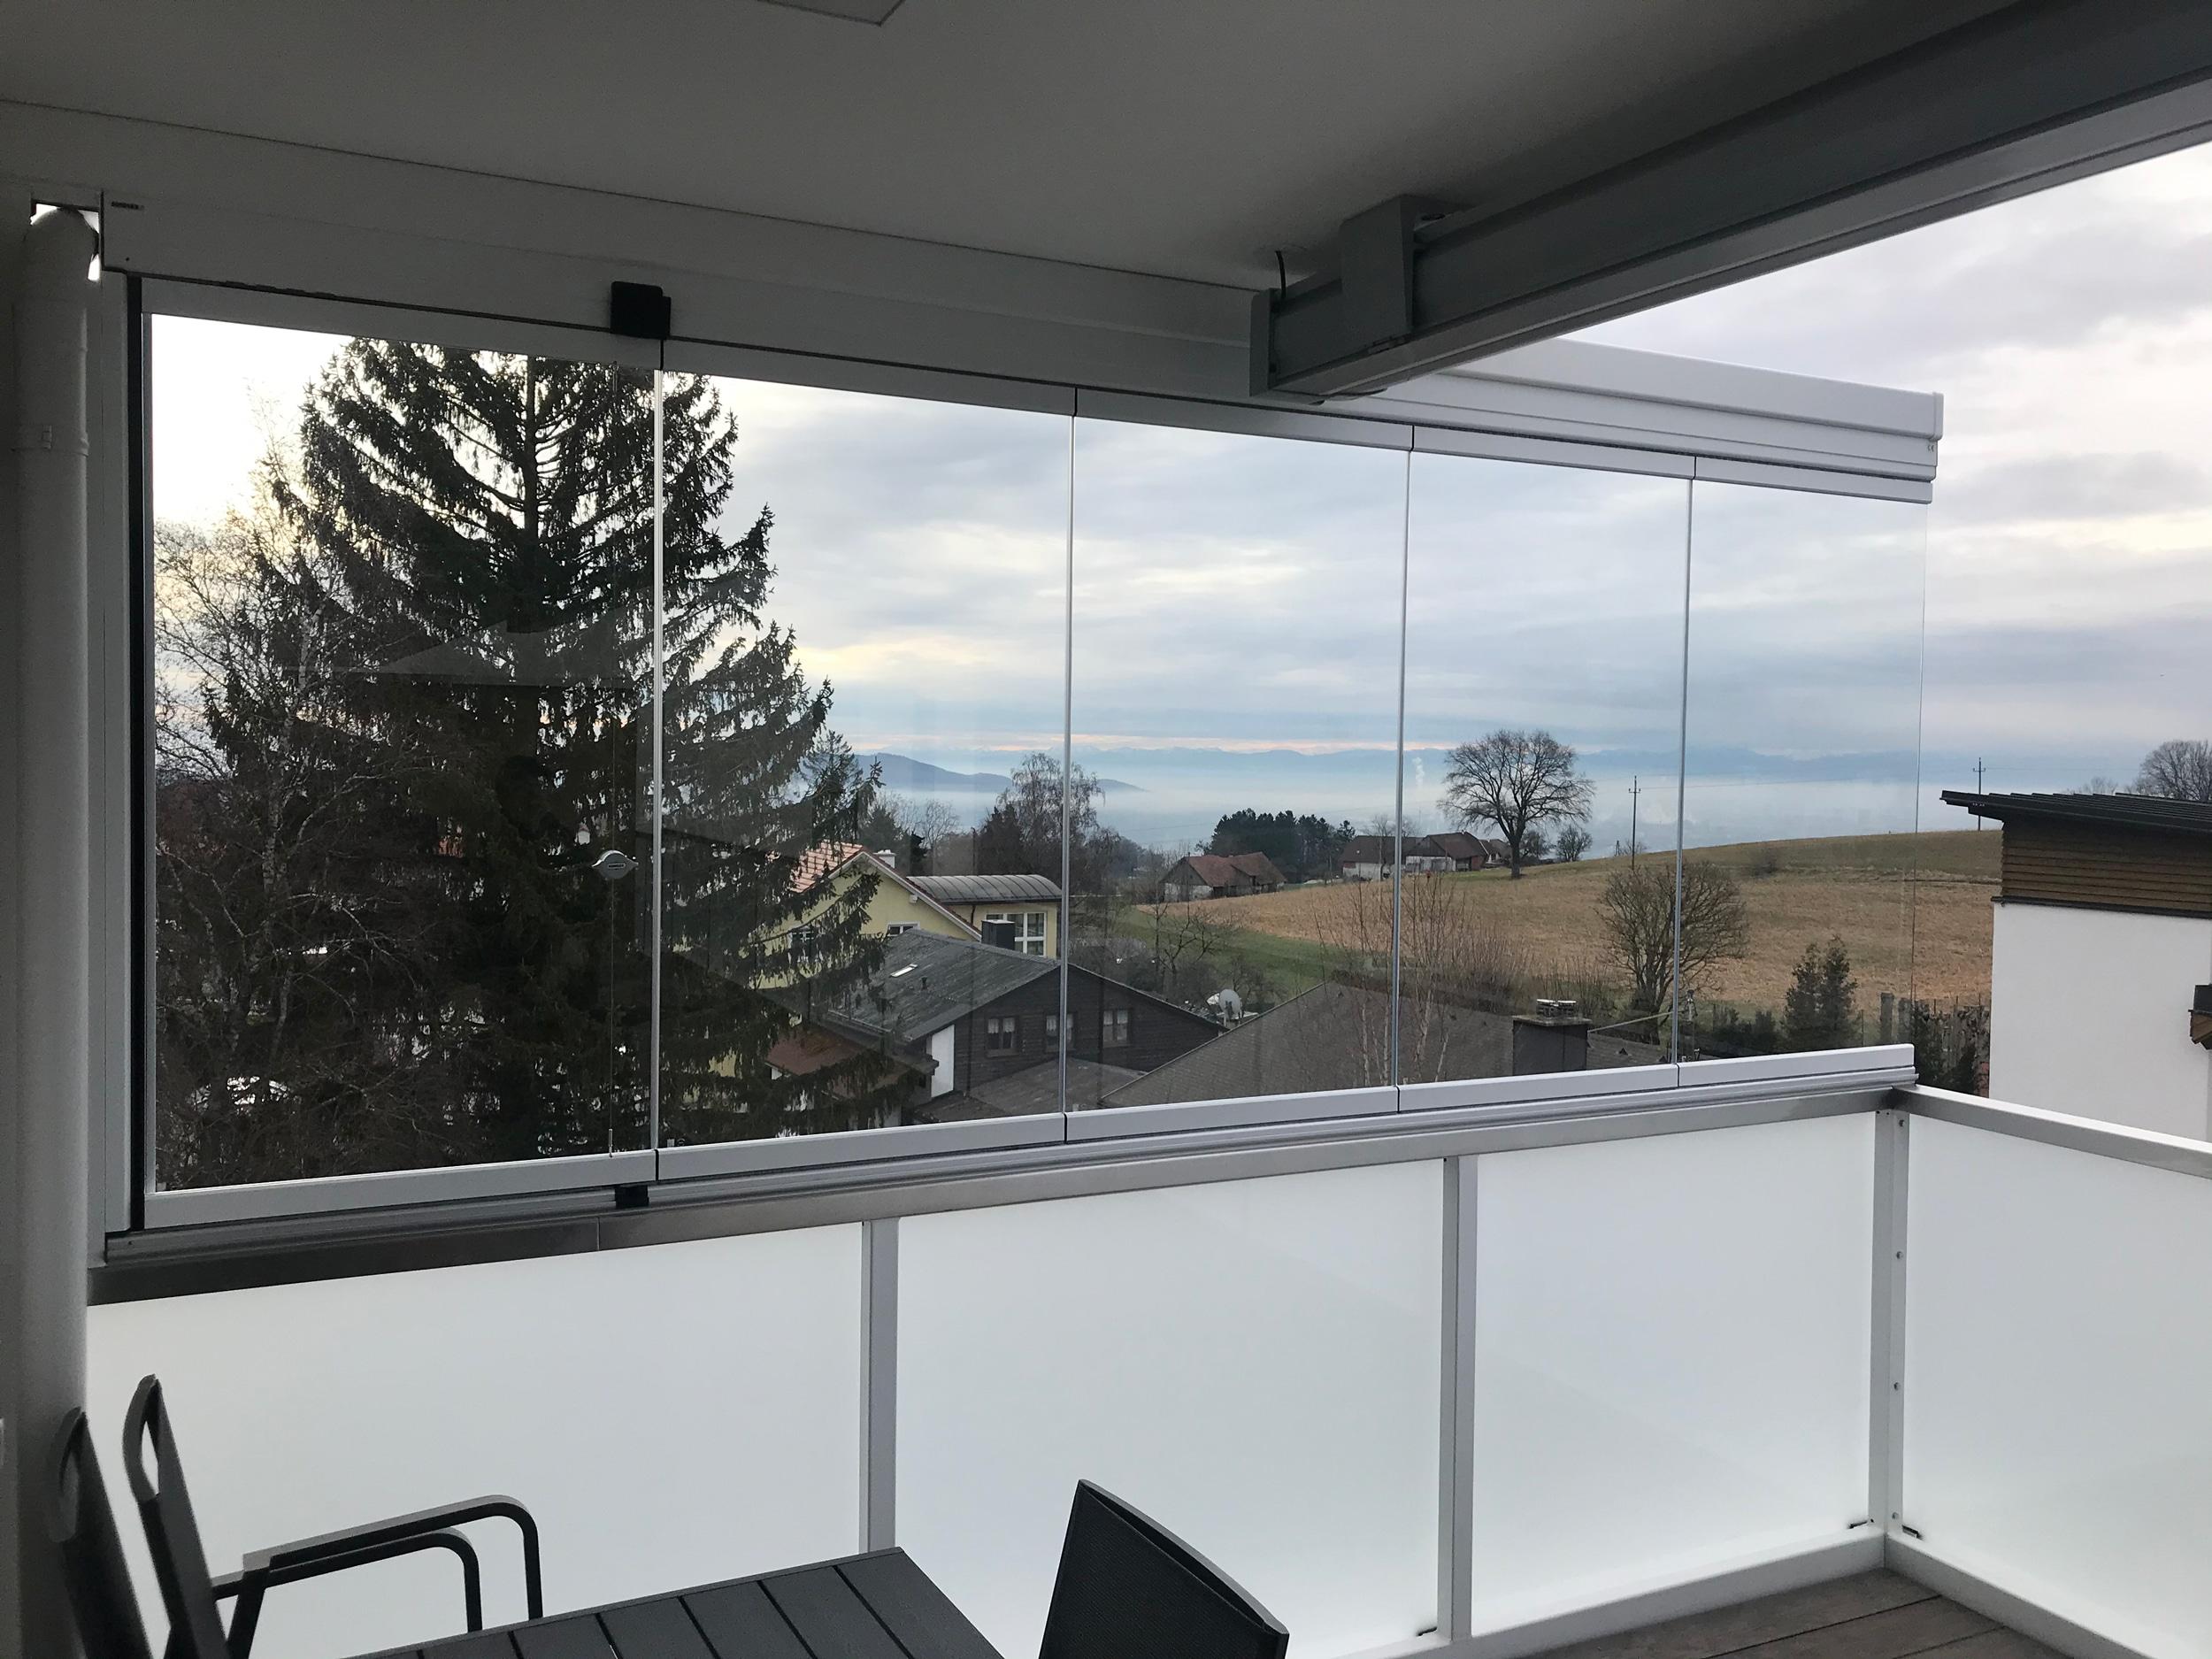 Balkonverglasung Windschutz